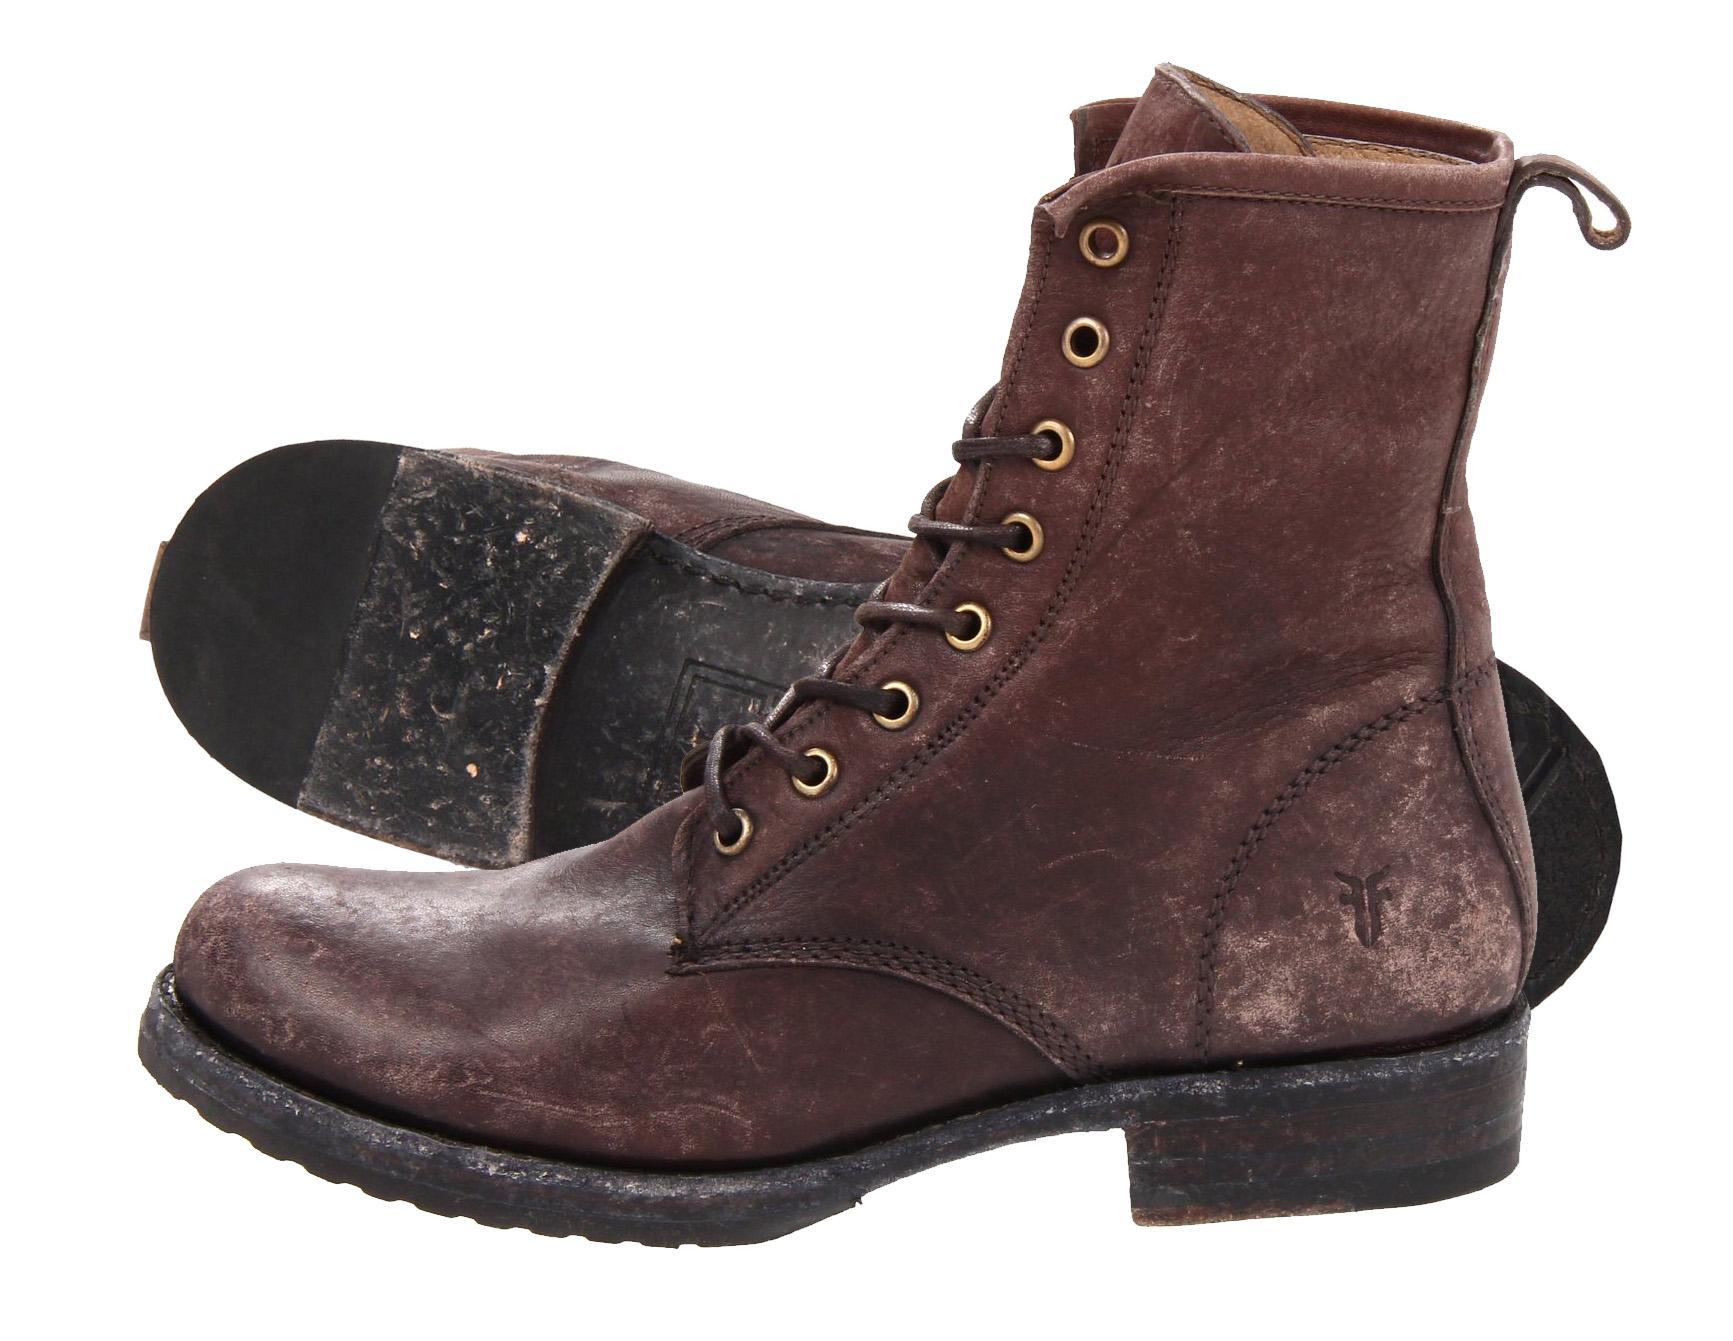 FRYE Womens Veronica Combat Boot dark brown stone washed